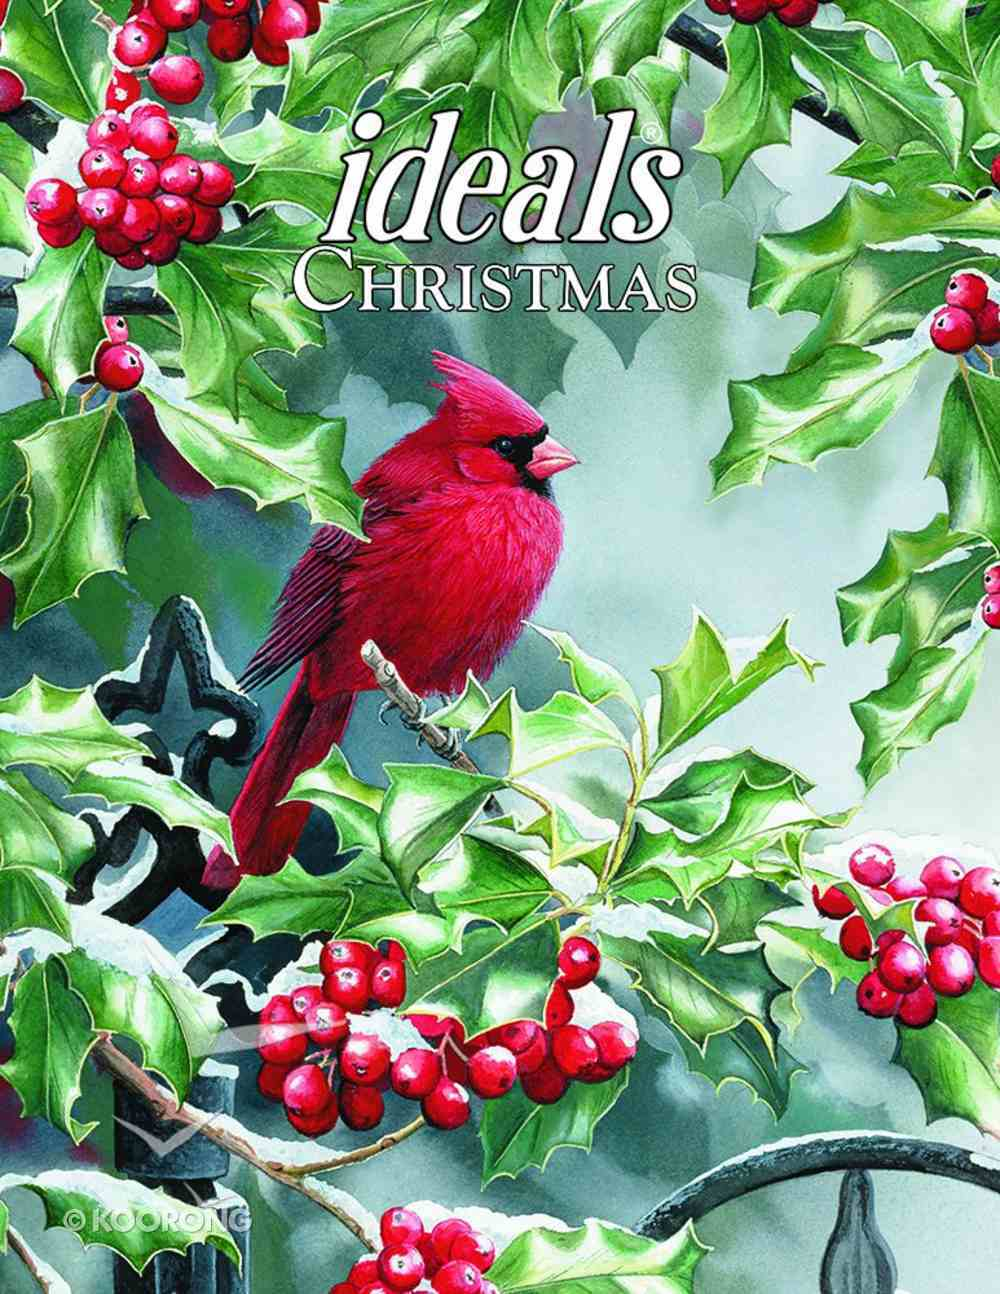 Christmas Ideals 2016 Paperback